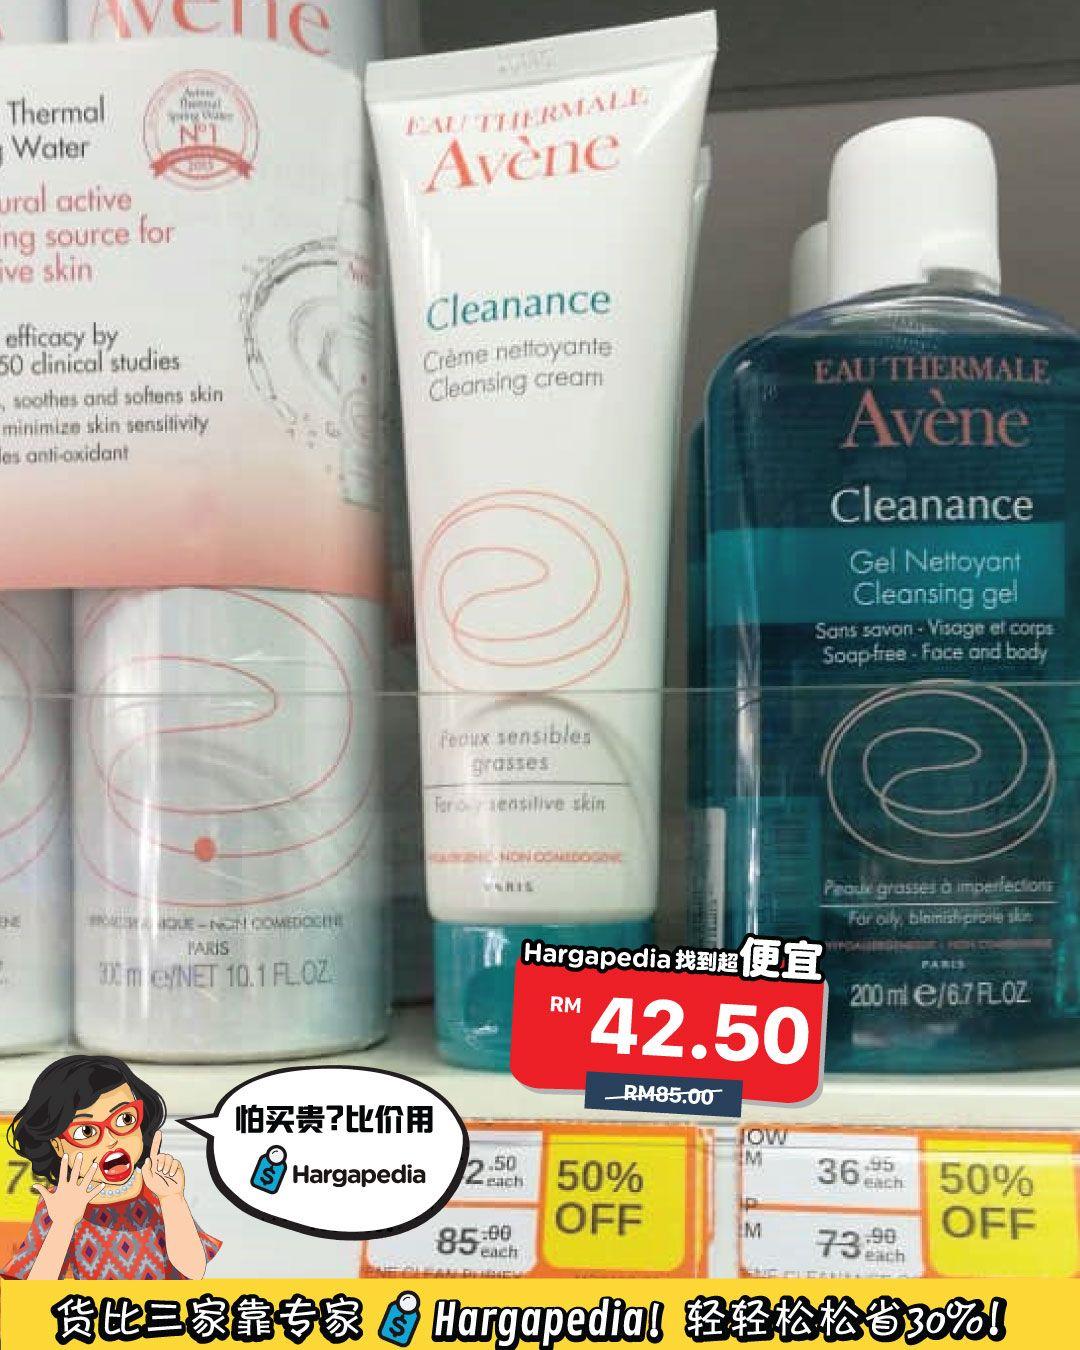 Guardian-Avene-Cleanser-1